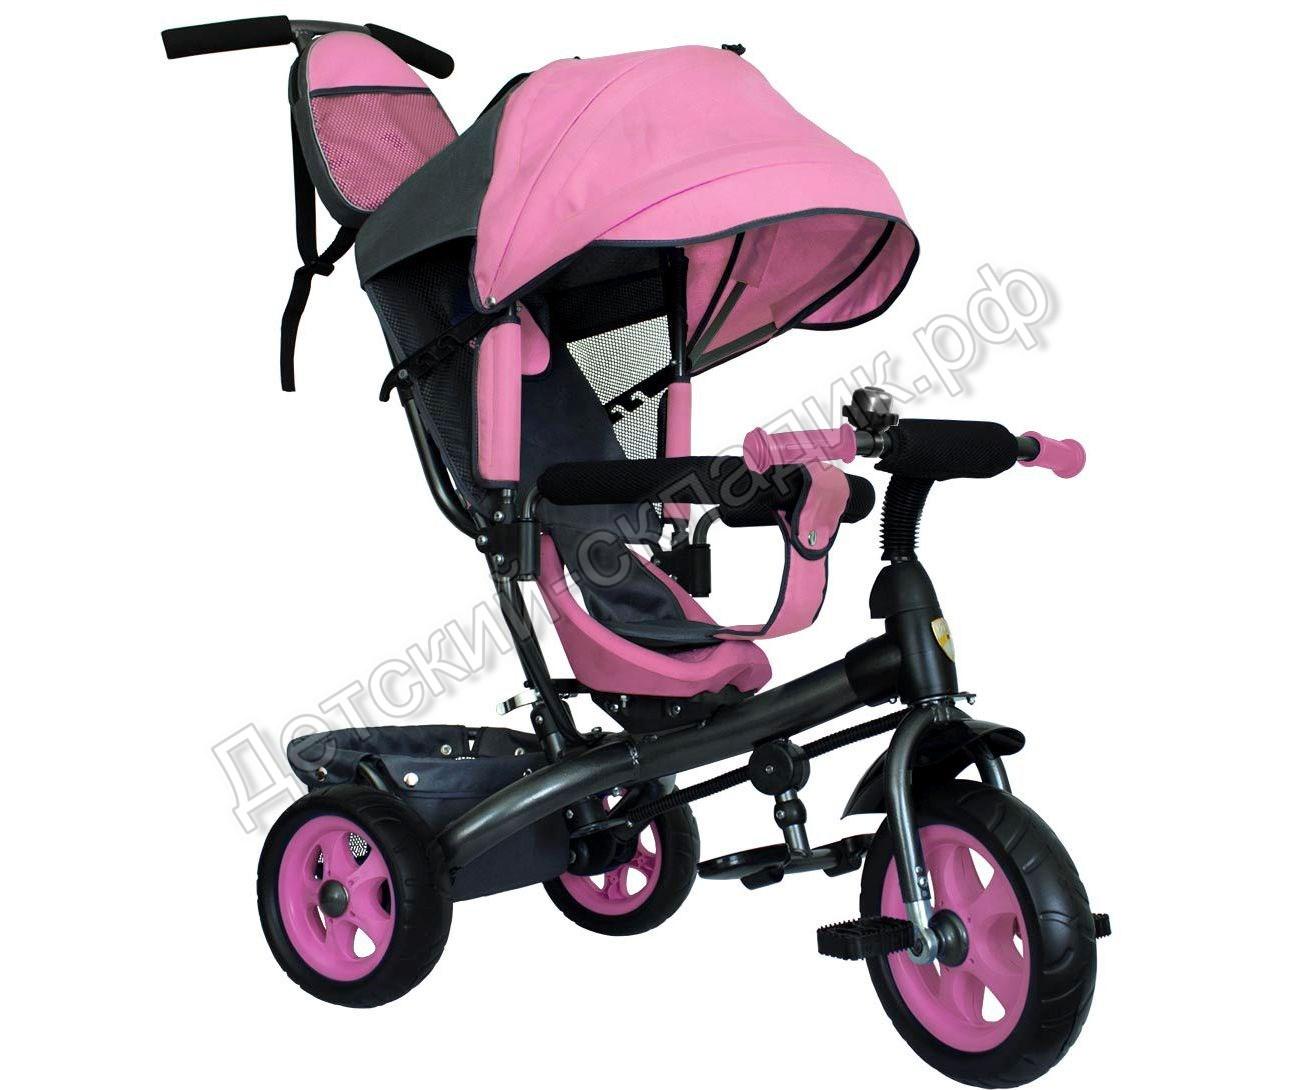 watermarked-велосипед виват роз+серый_cr